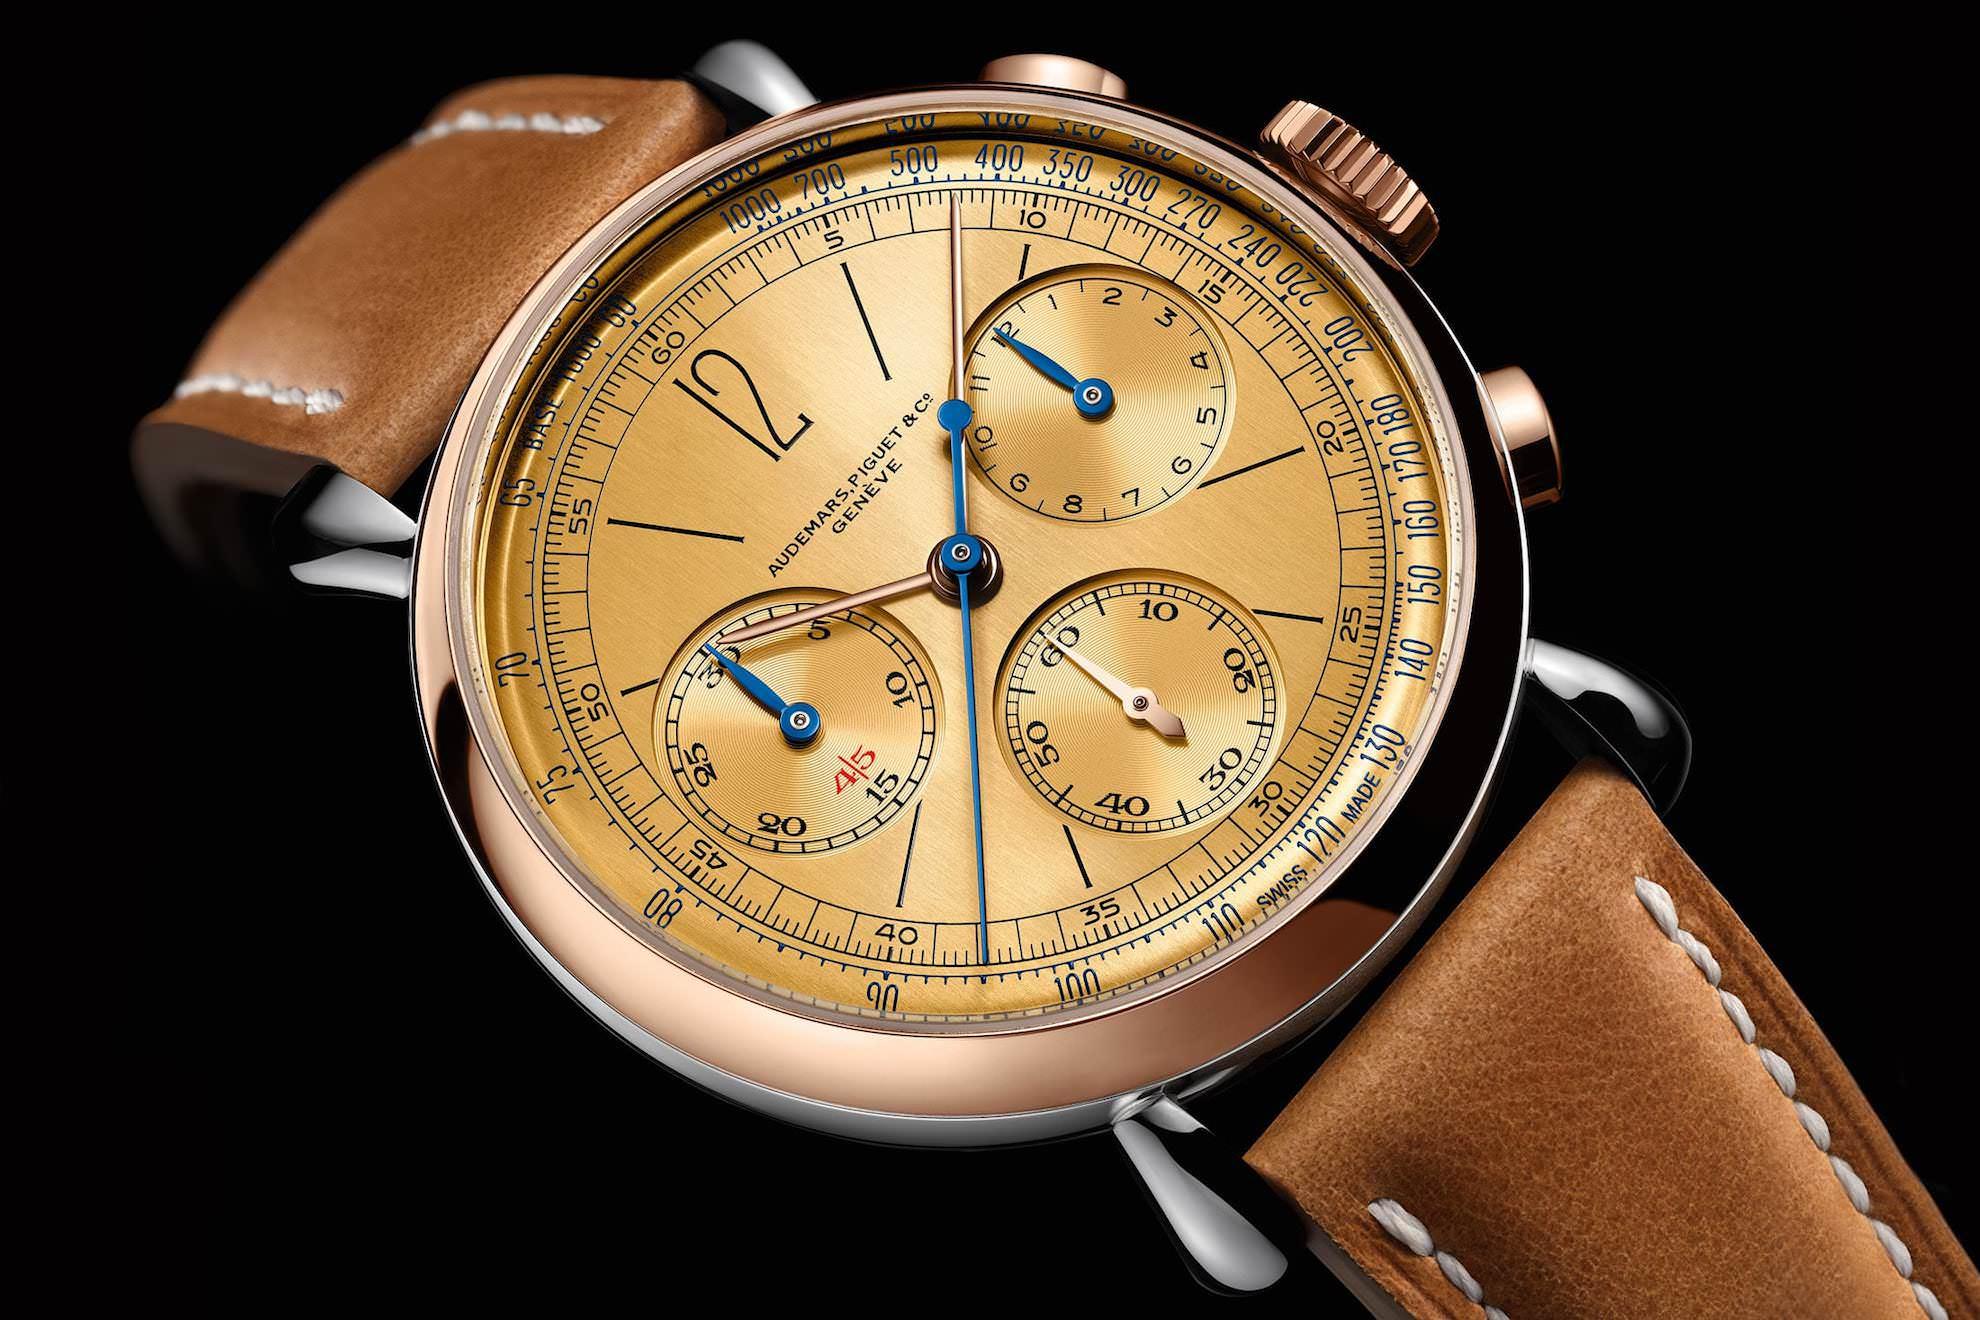 Audemars Piguet [RE]master01 Chronograph